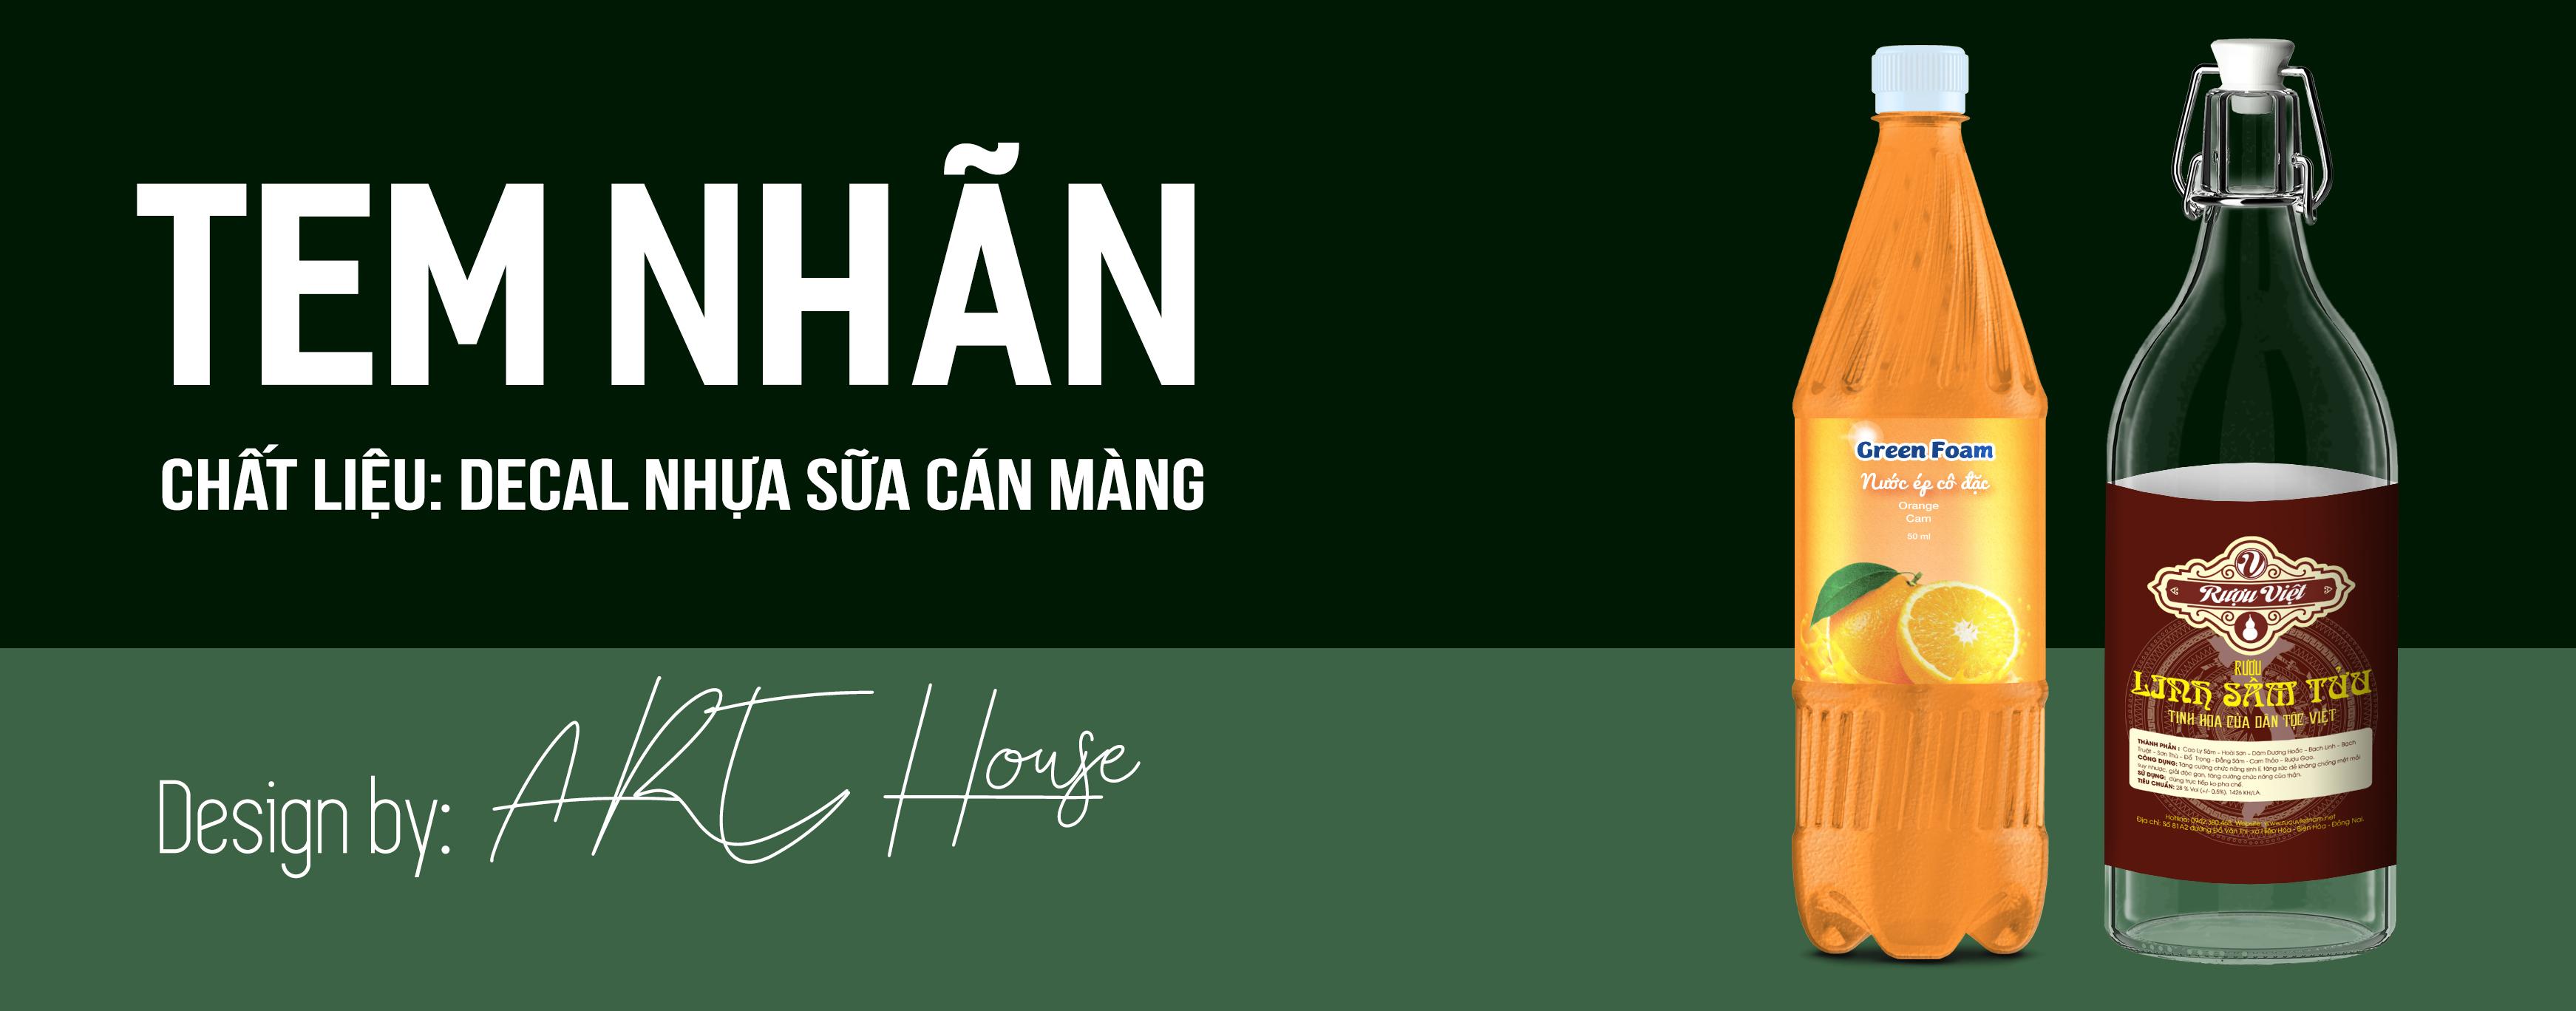 in-tem-nhan-4